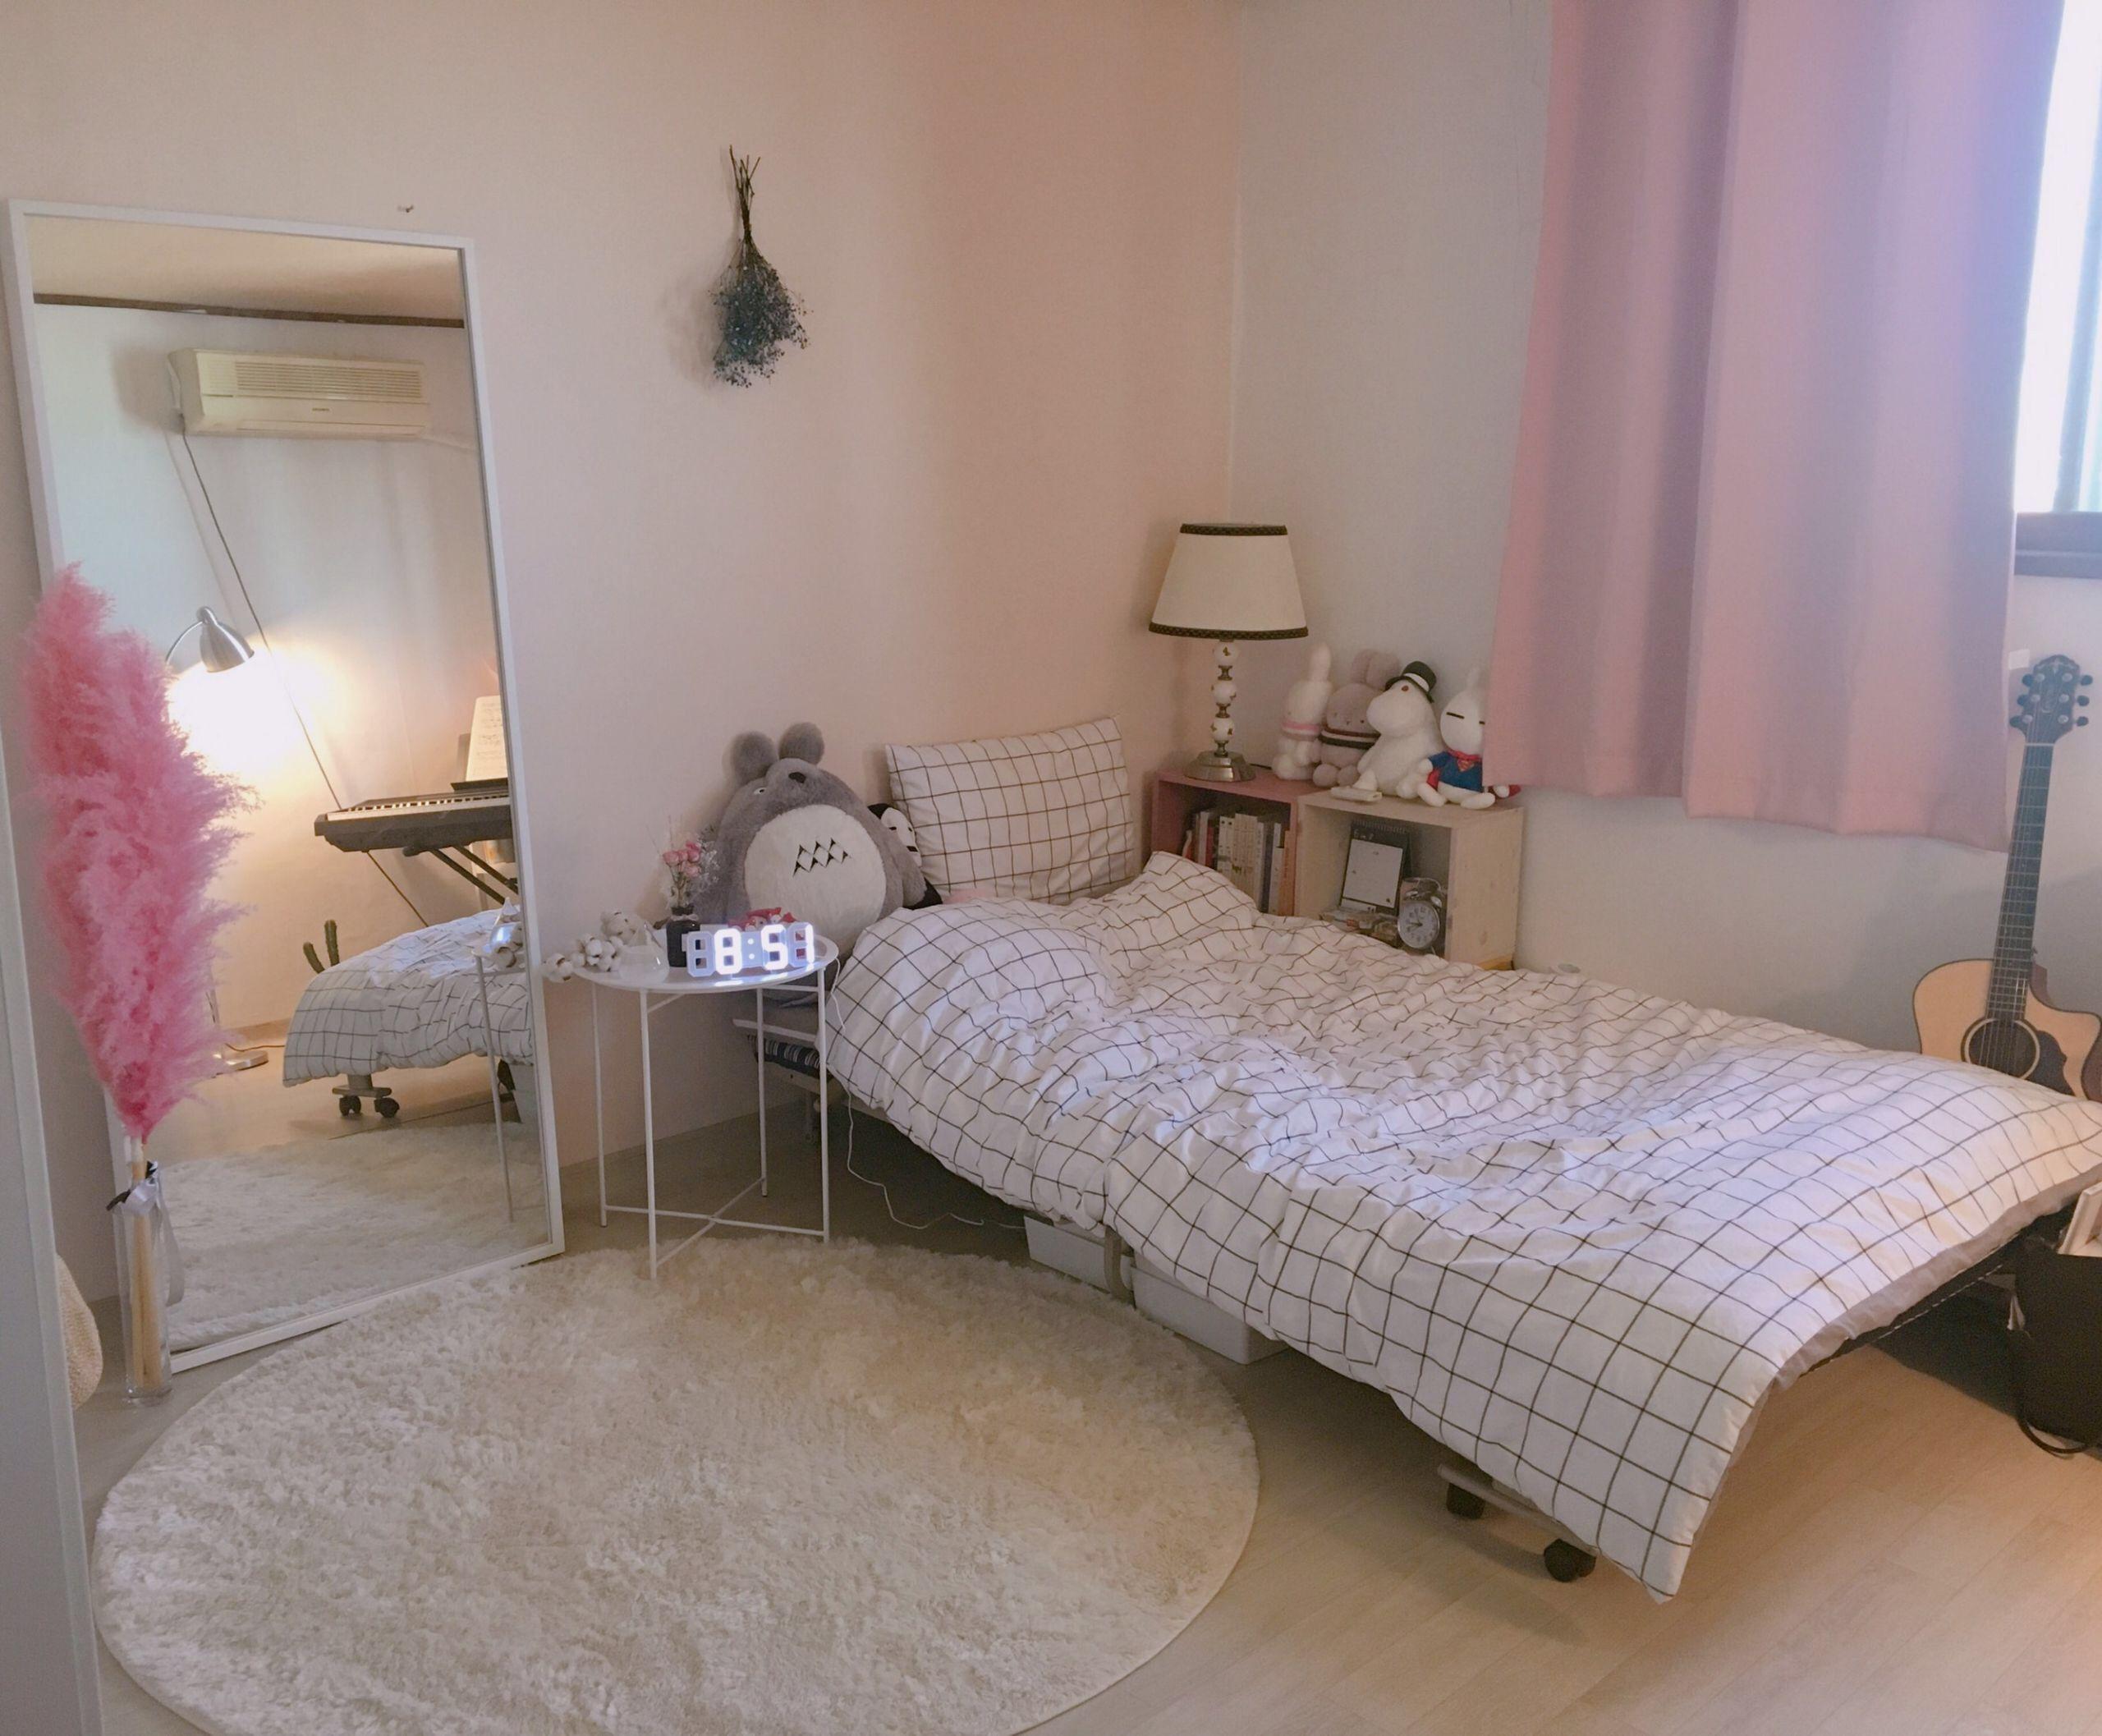 ˗ˏˋ🐻ˎˊ˗ 𝐩𝐢𝐧𝐭𝐞𝐫𝐞𝐬𝐭: 𝟓𝟎𝐟𝐬𝐤 | Aesthetic bedroom, Room, Room decor